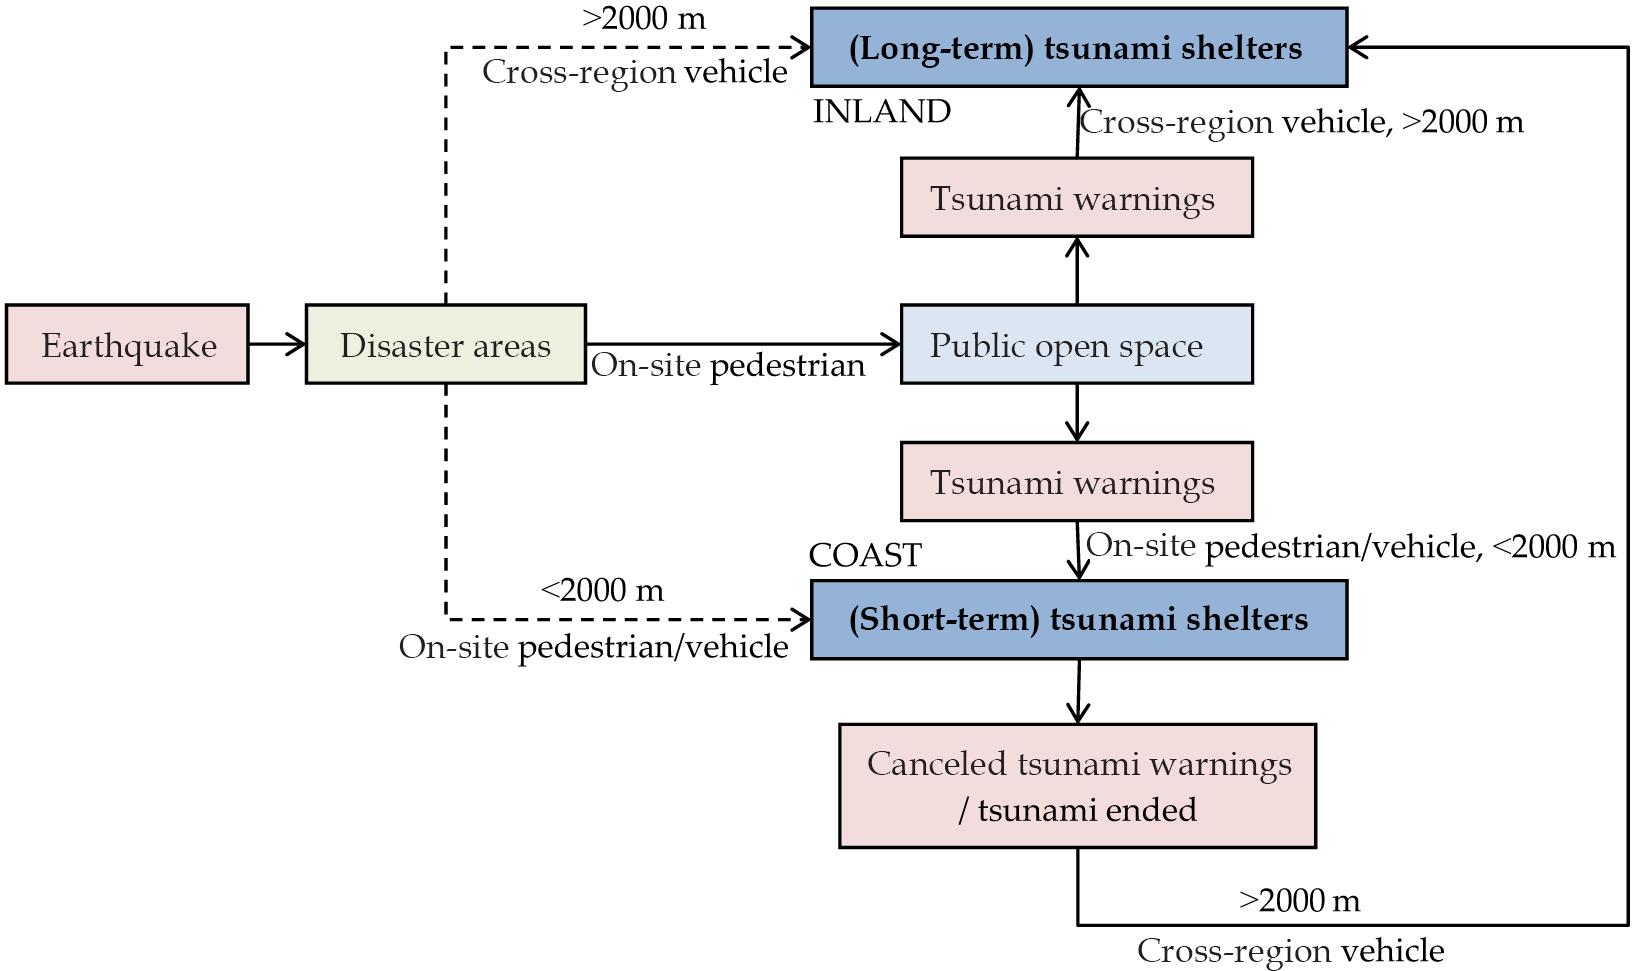 NHESS - Strategies for increasing tsunami shelter